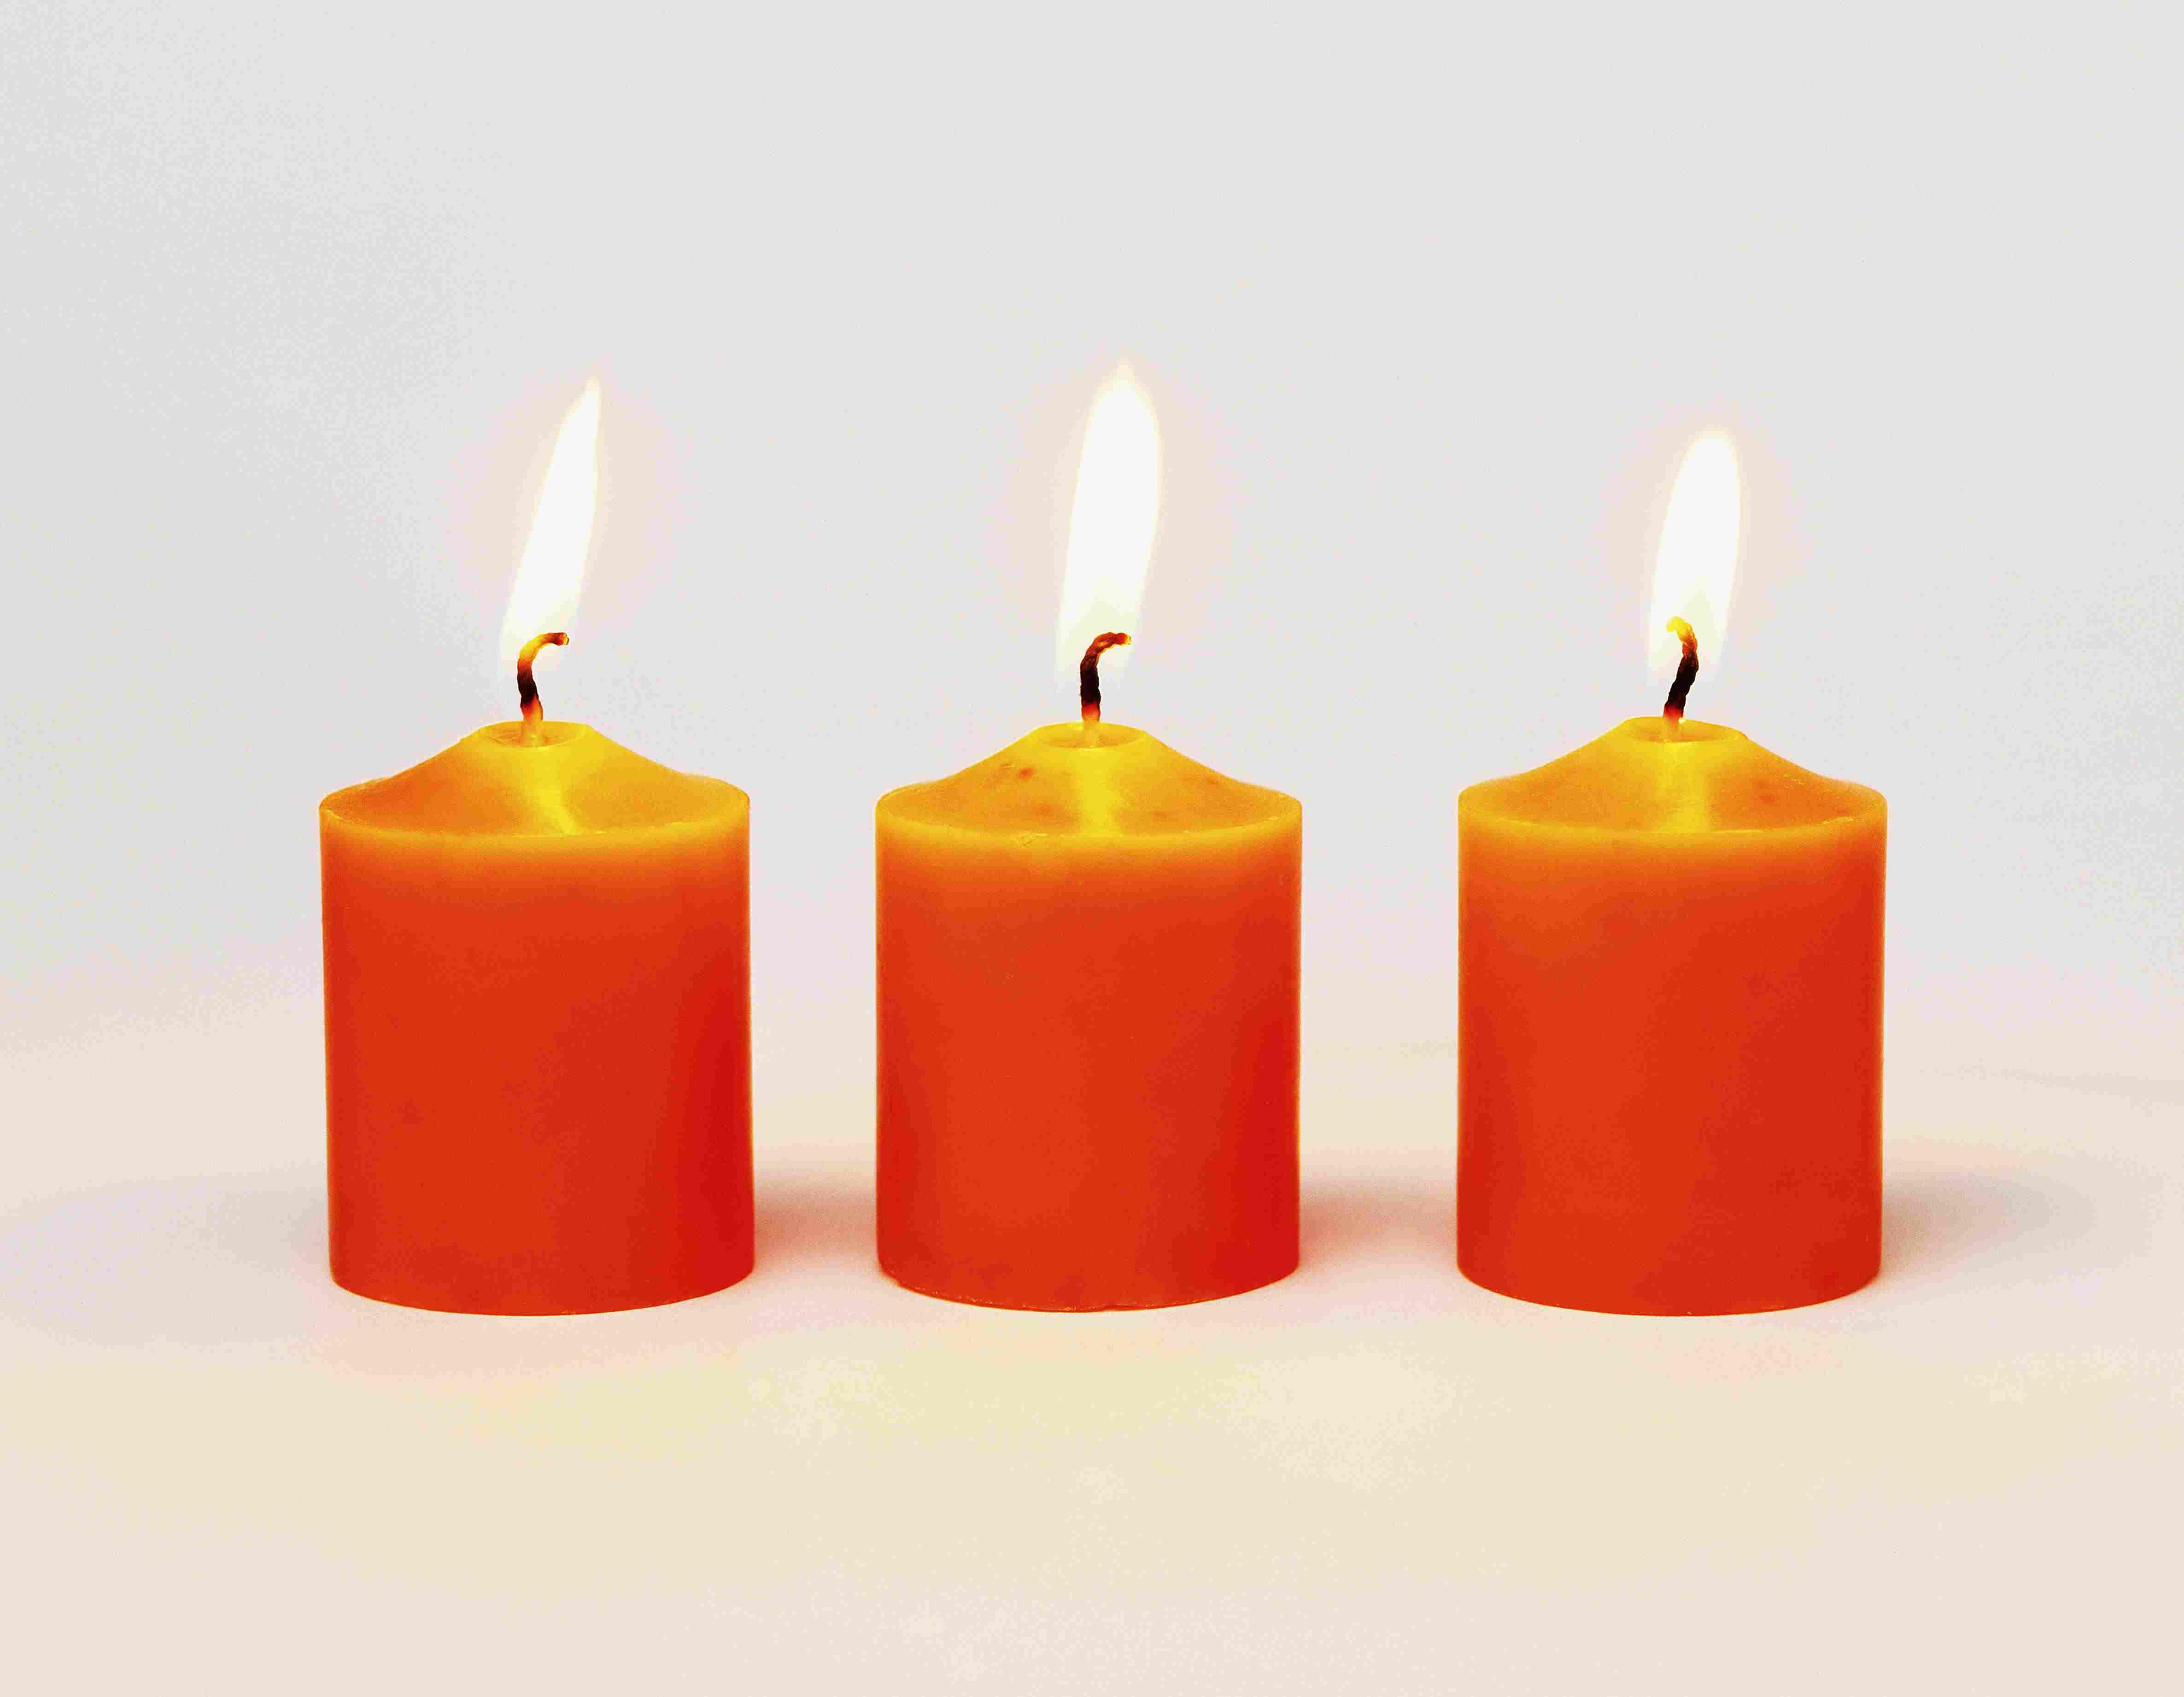 Three lit orange candles